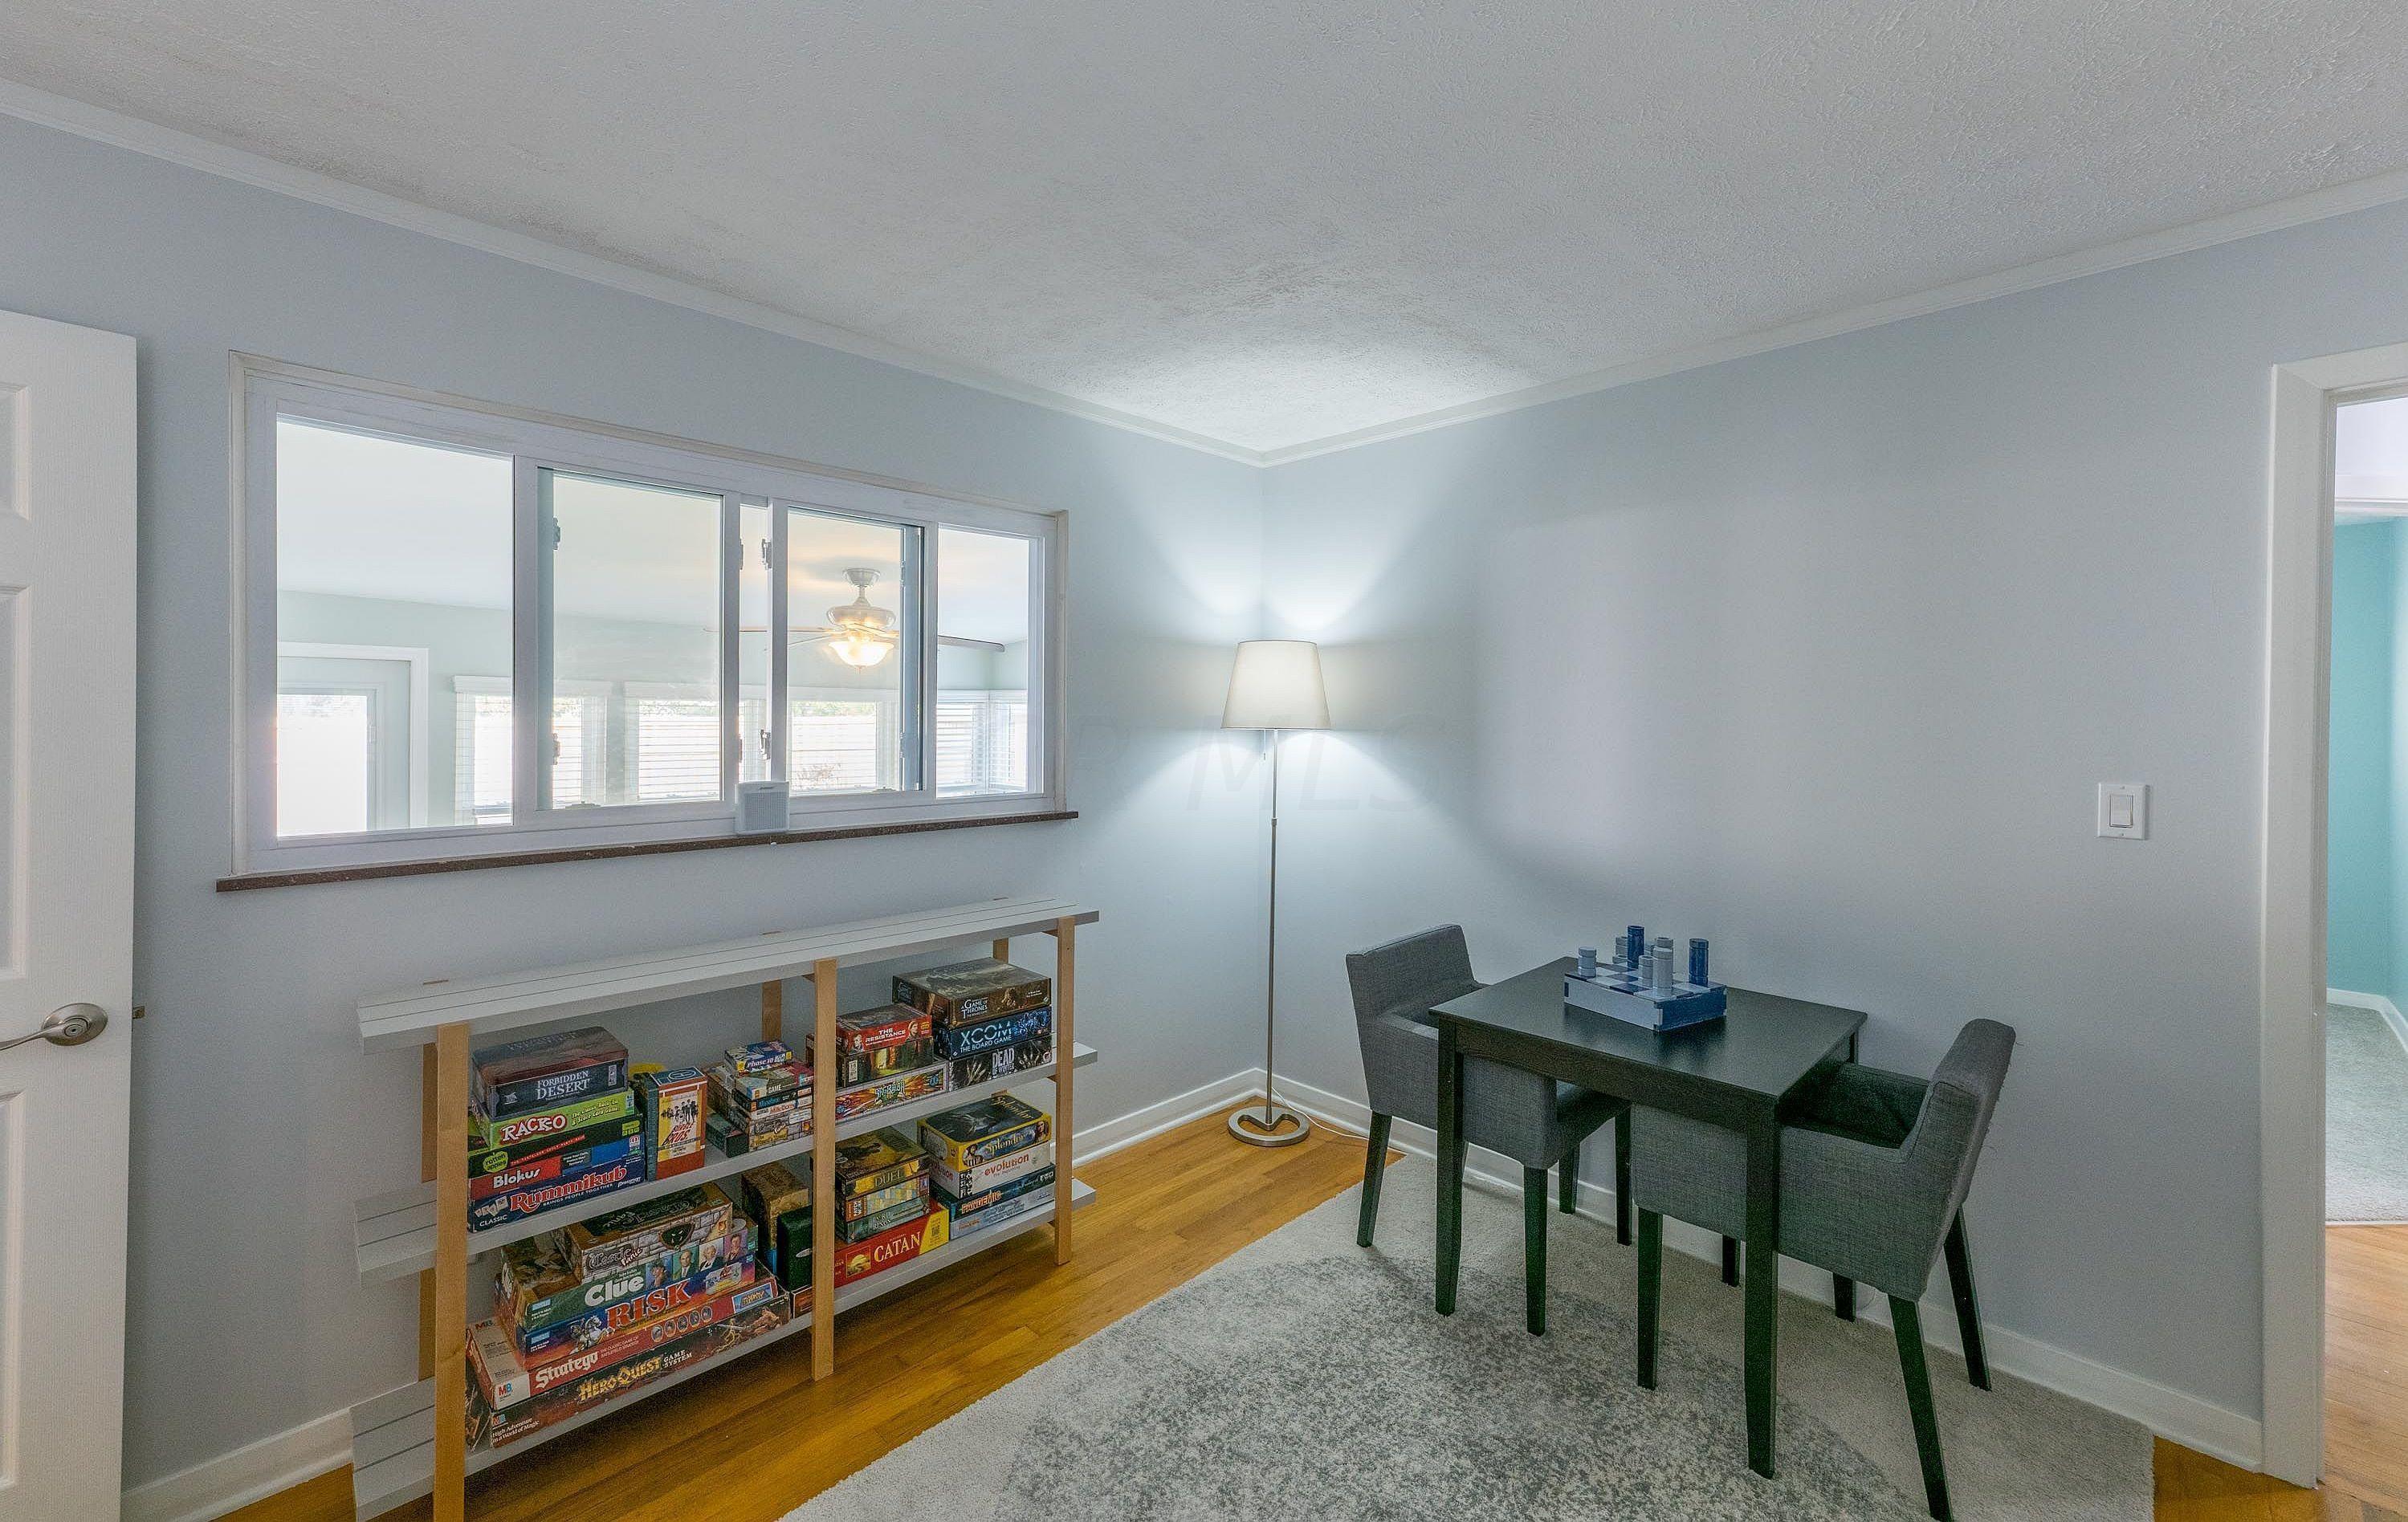 Bedroom - 3 or office